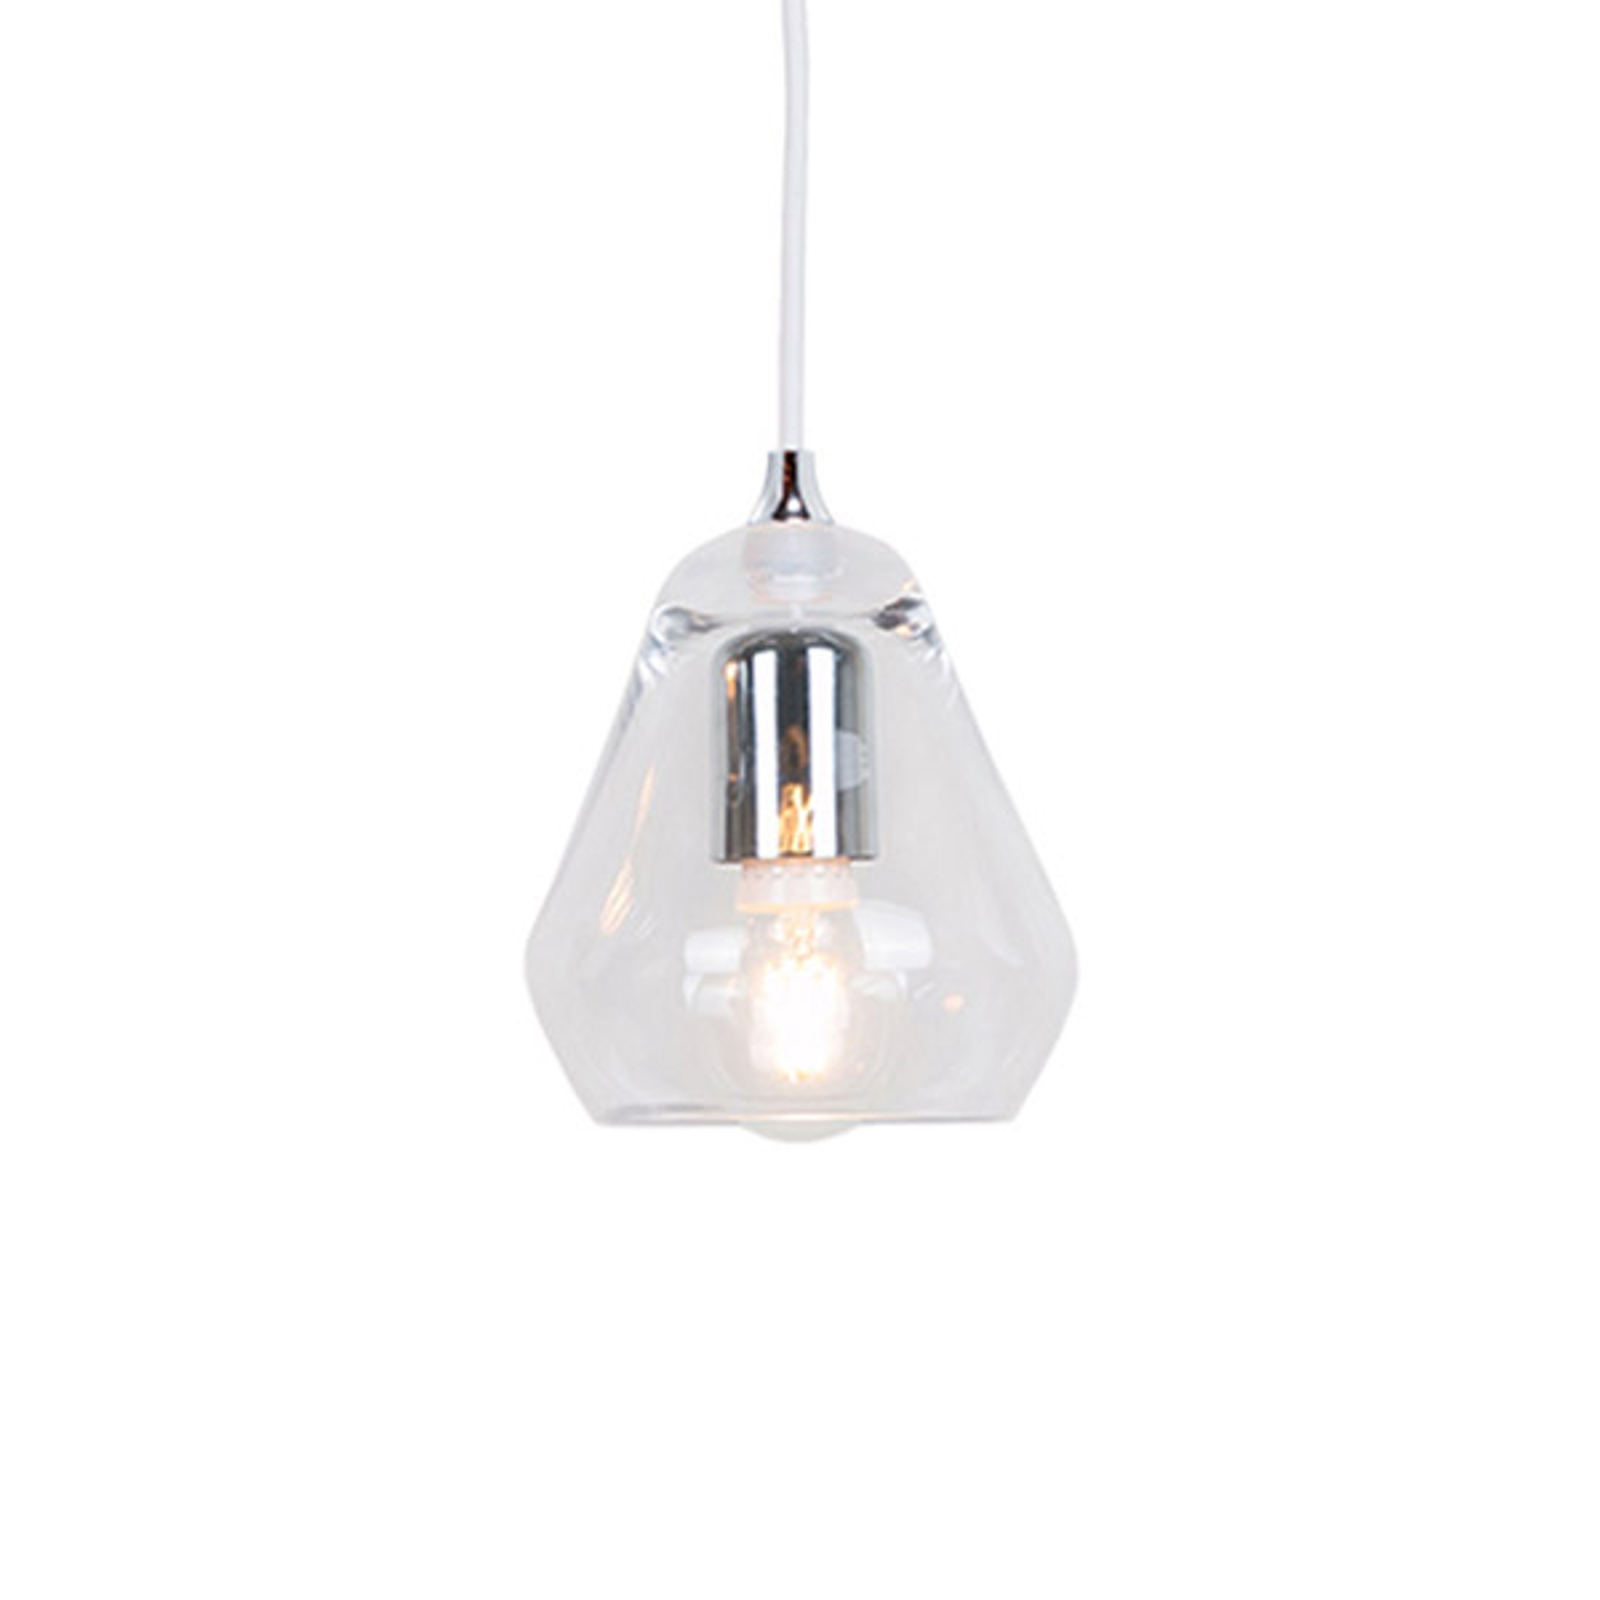 Innermost Core 15 - glashængelampe, klar